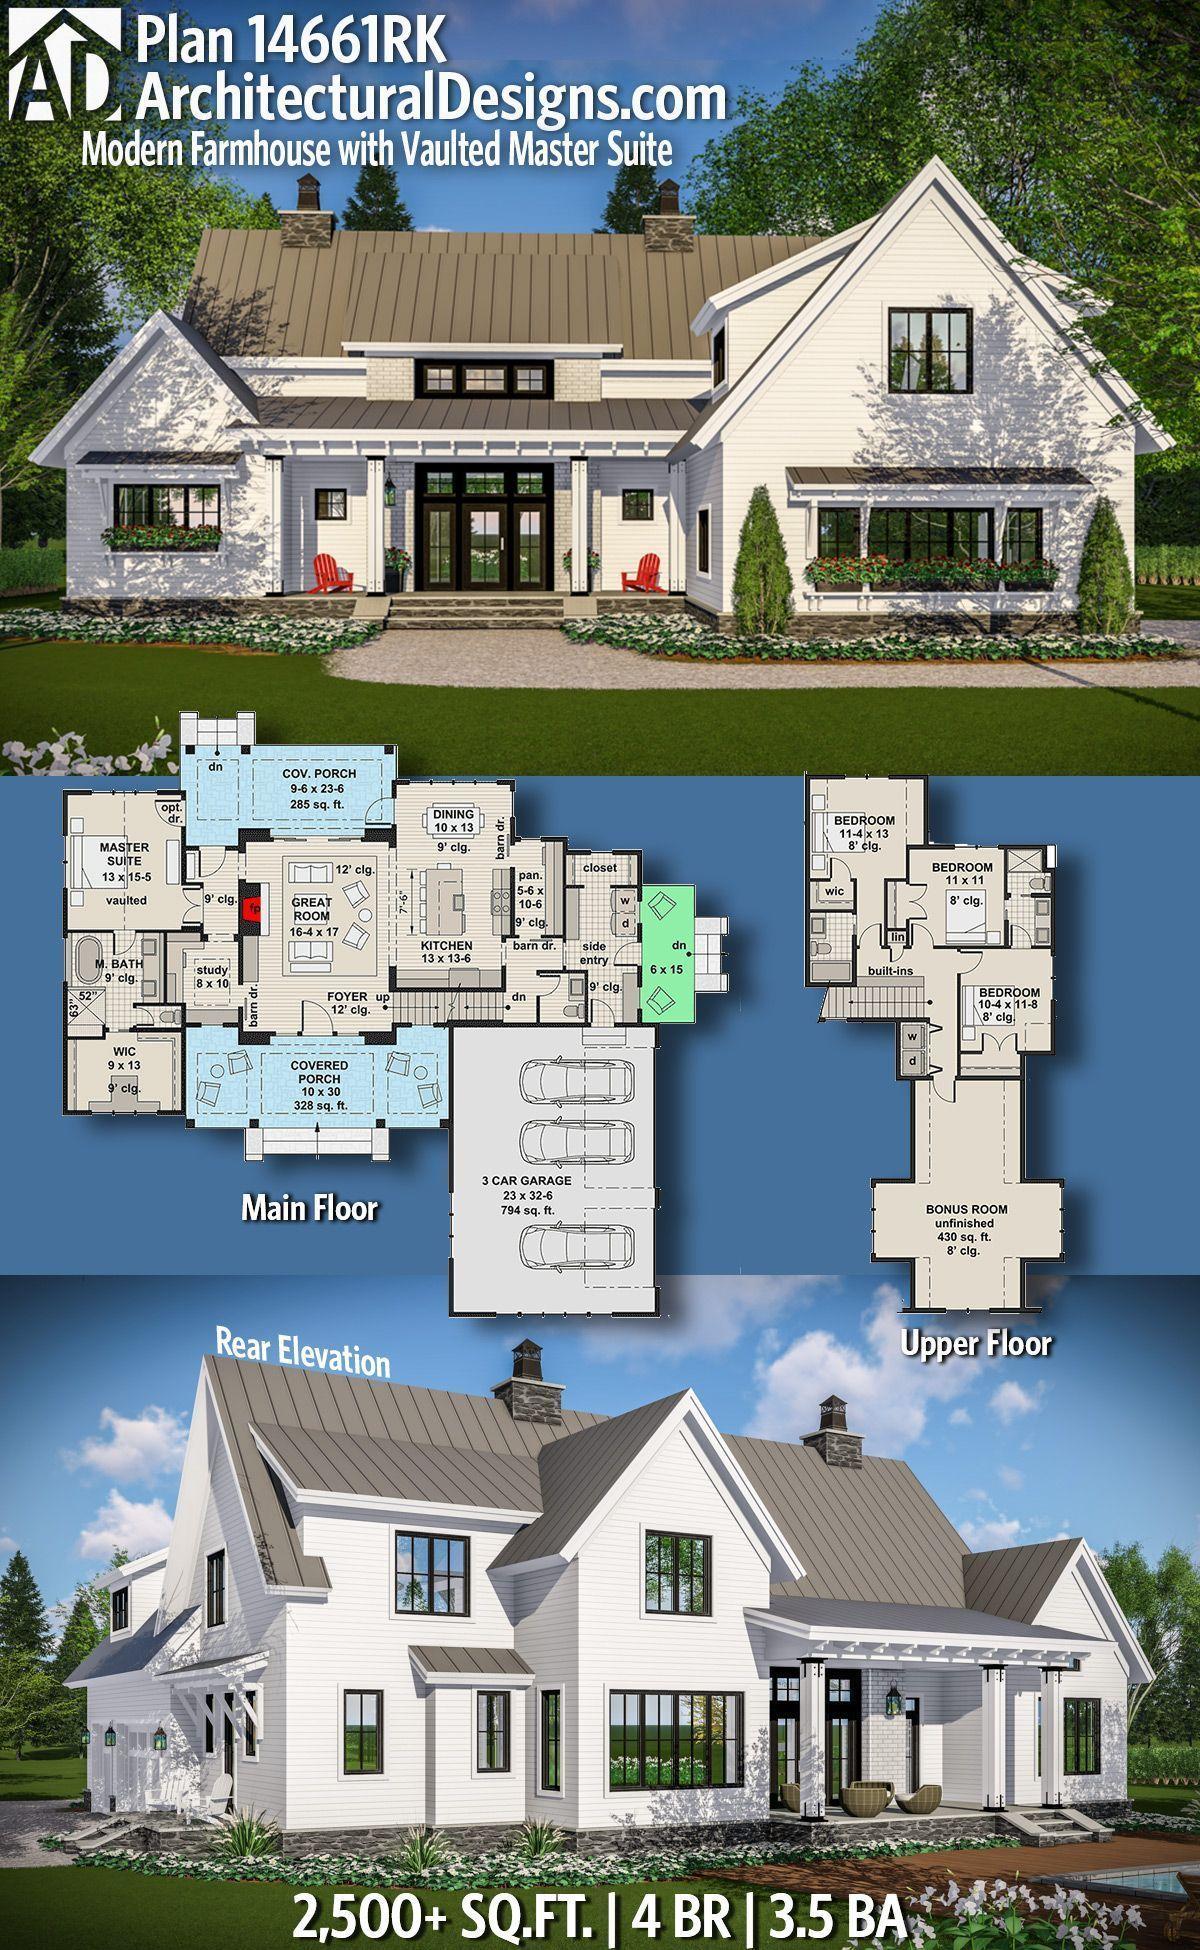 Architectural Designs Modern Farmhouse Plan 14461RK gives